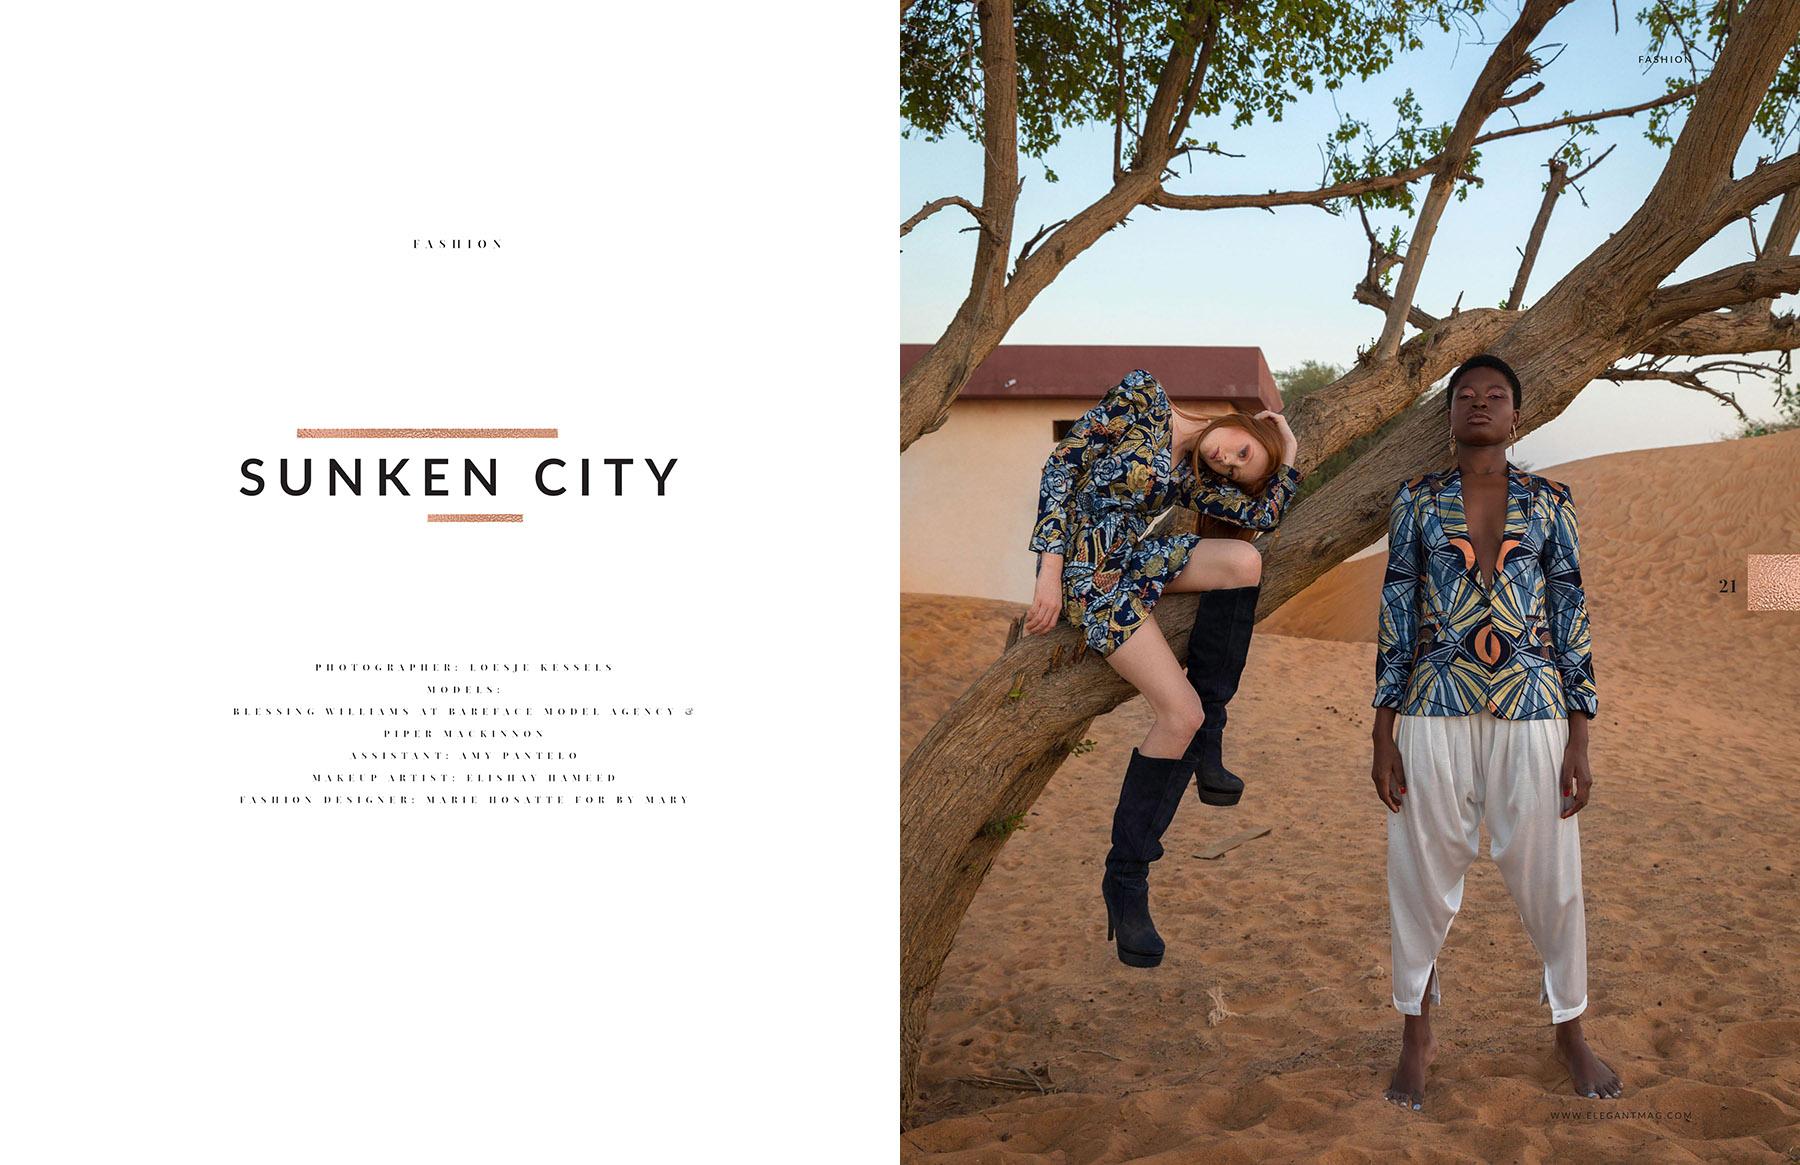 Editorial photoshoot published in Elegant Magazine by Loesje Kessels Fashion Photographer Dubai